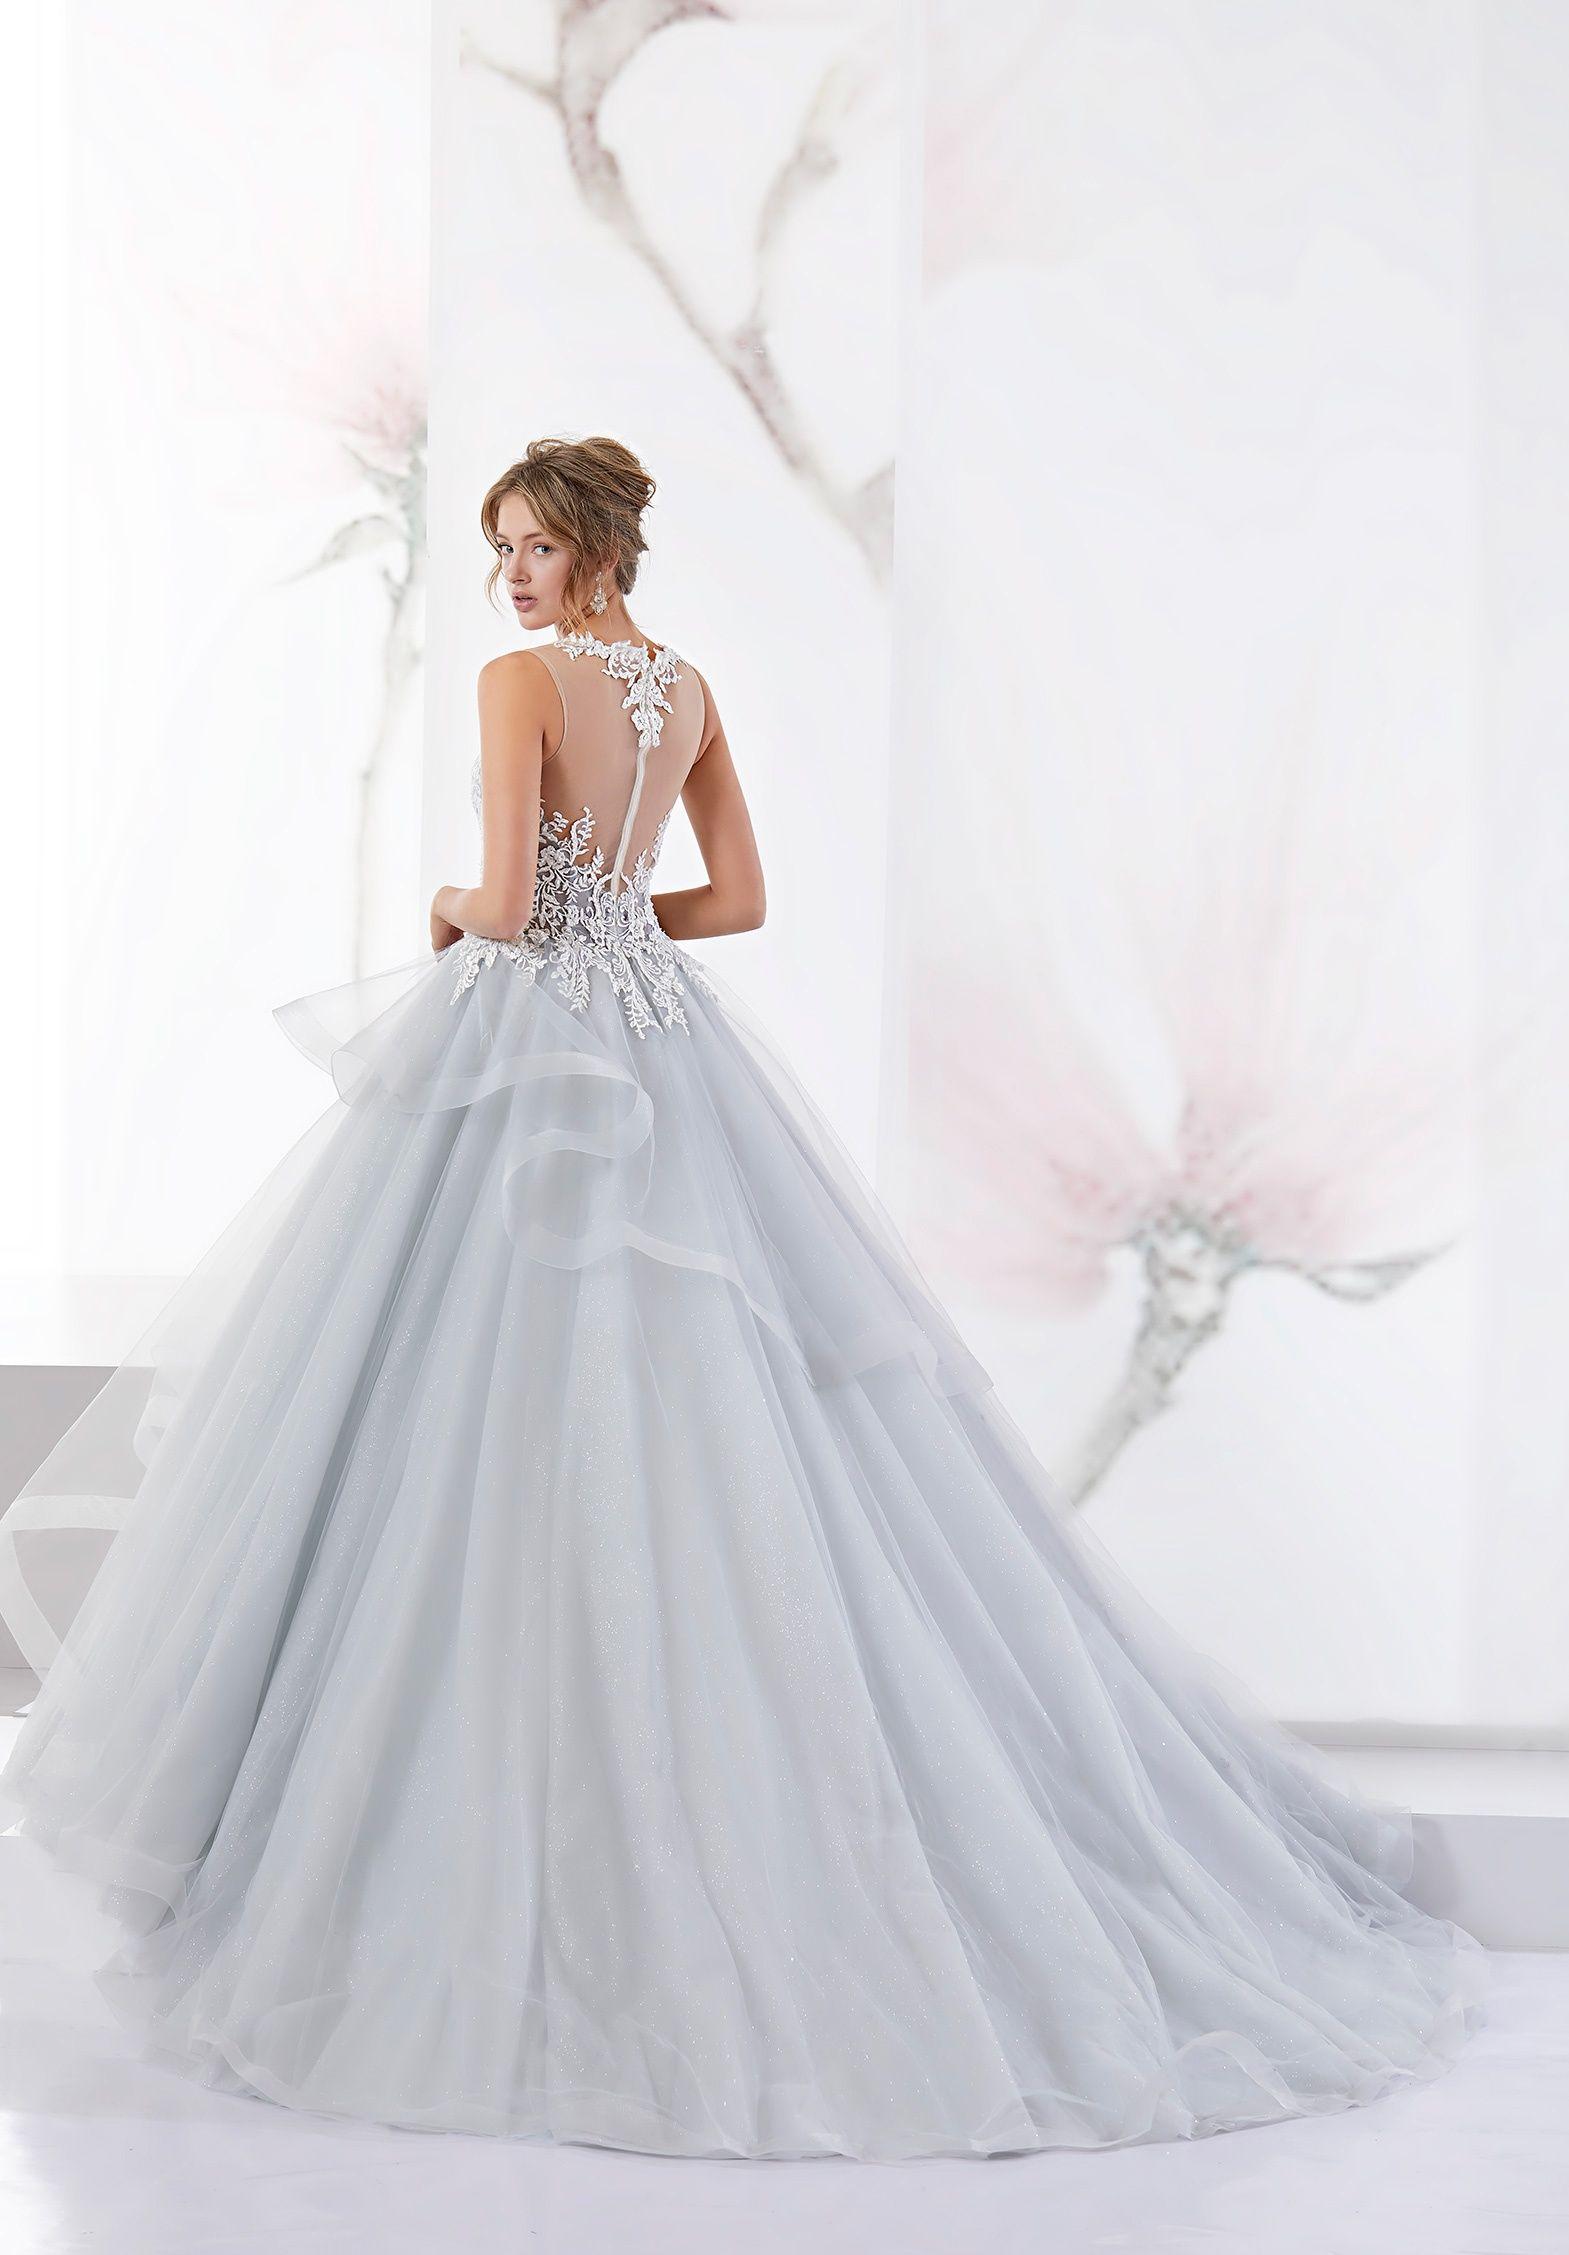 Abiti da sposa jolies 2018